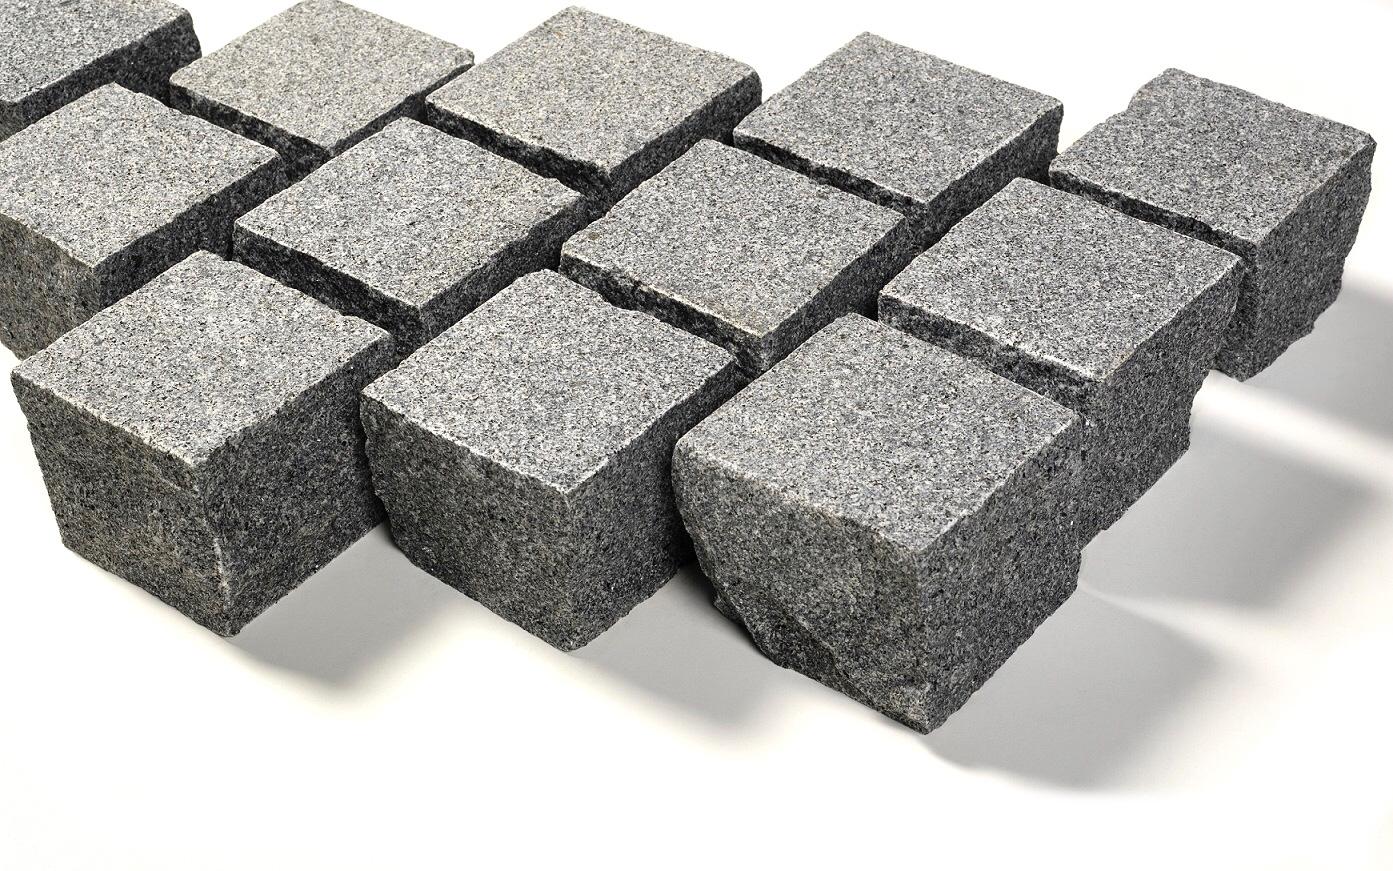 Granit Edelkleinpflaster 10x10x8 cm dunkelgrau